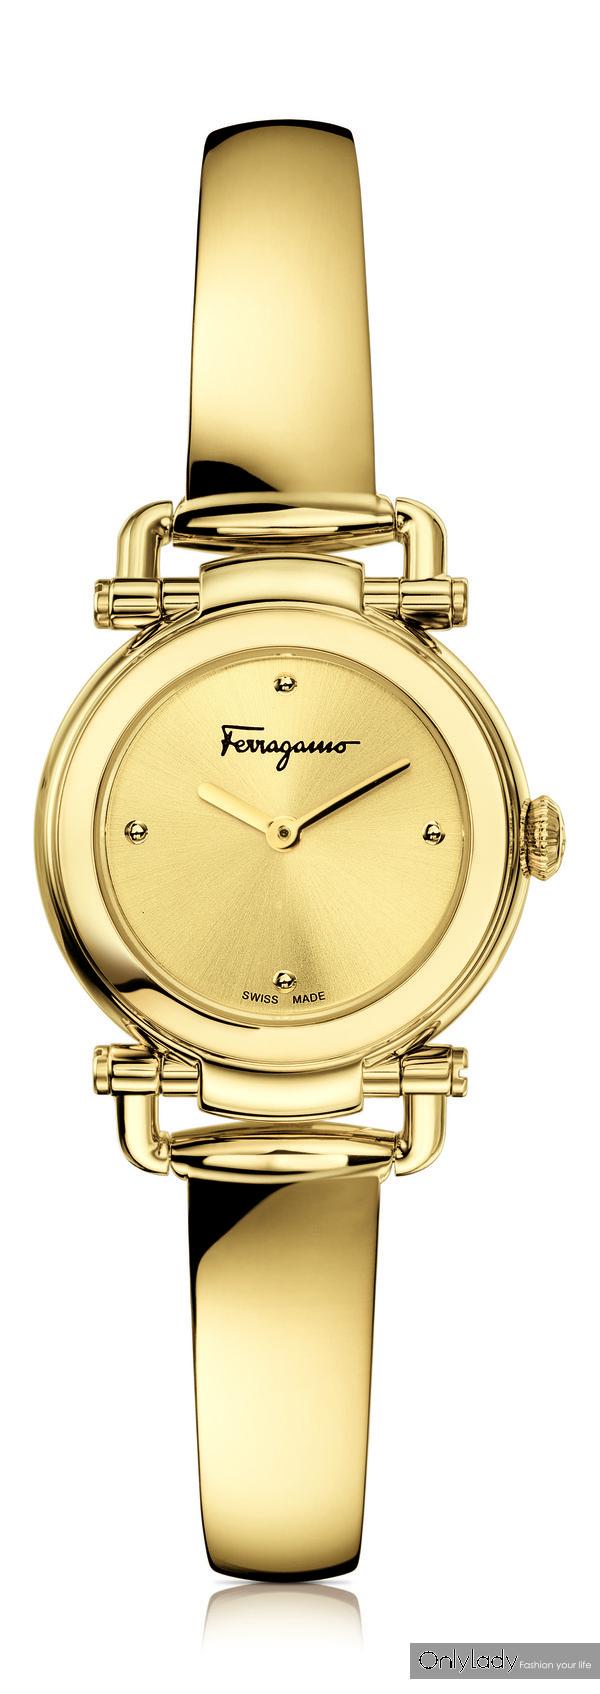 FERRAGAMO CASUAL 金色手镯款